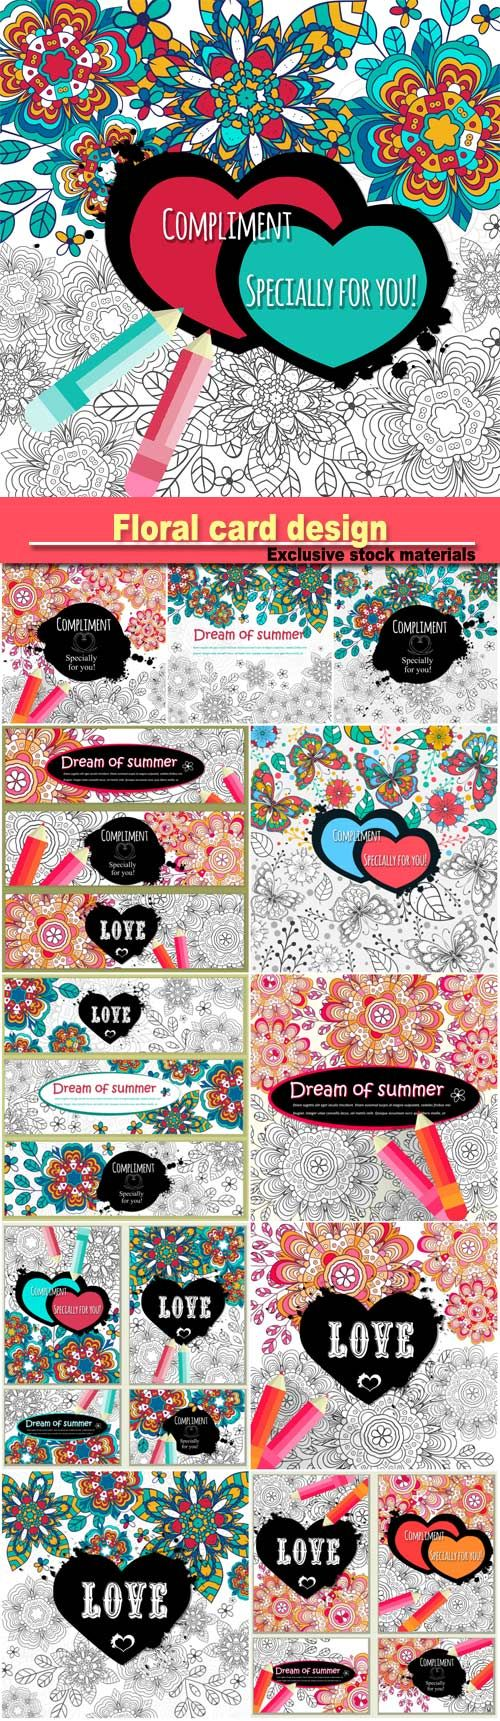 Floral card design, flowers and leaf doodle elements, vector decorative invitation